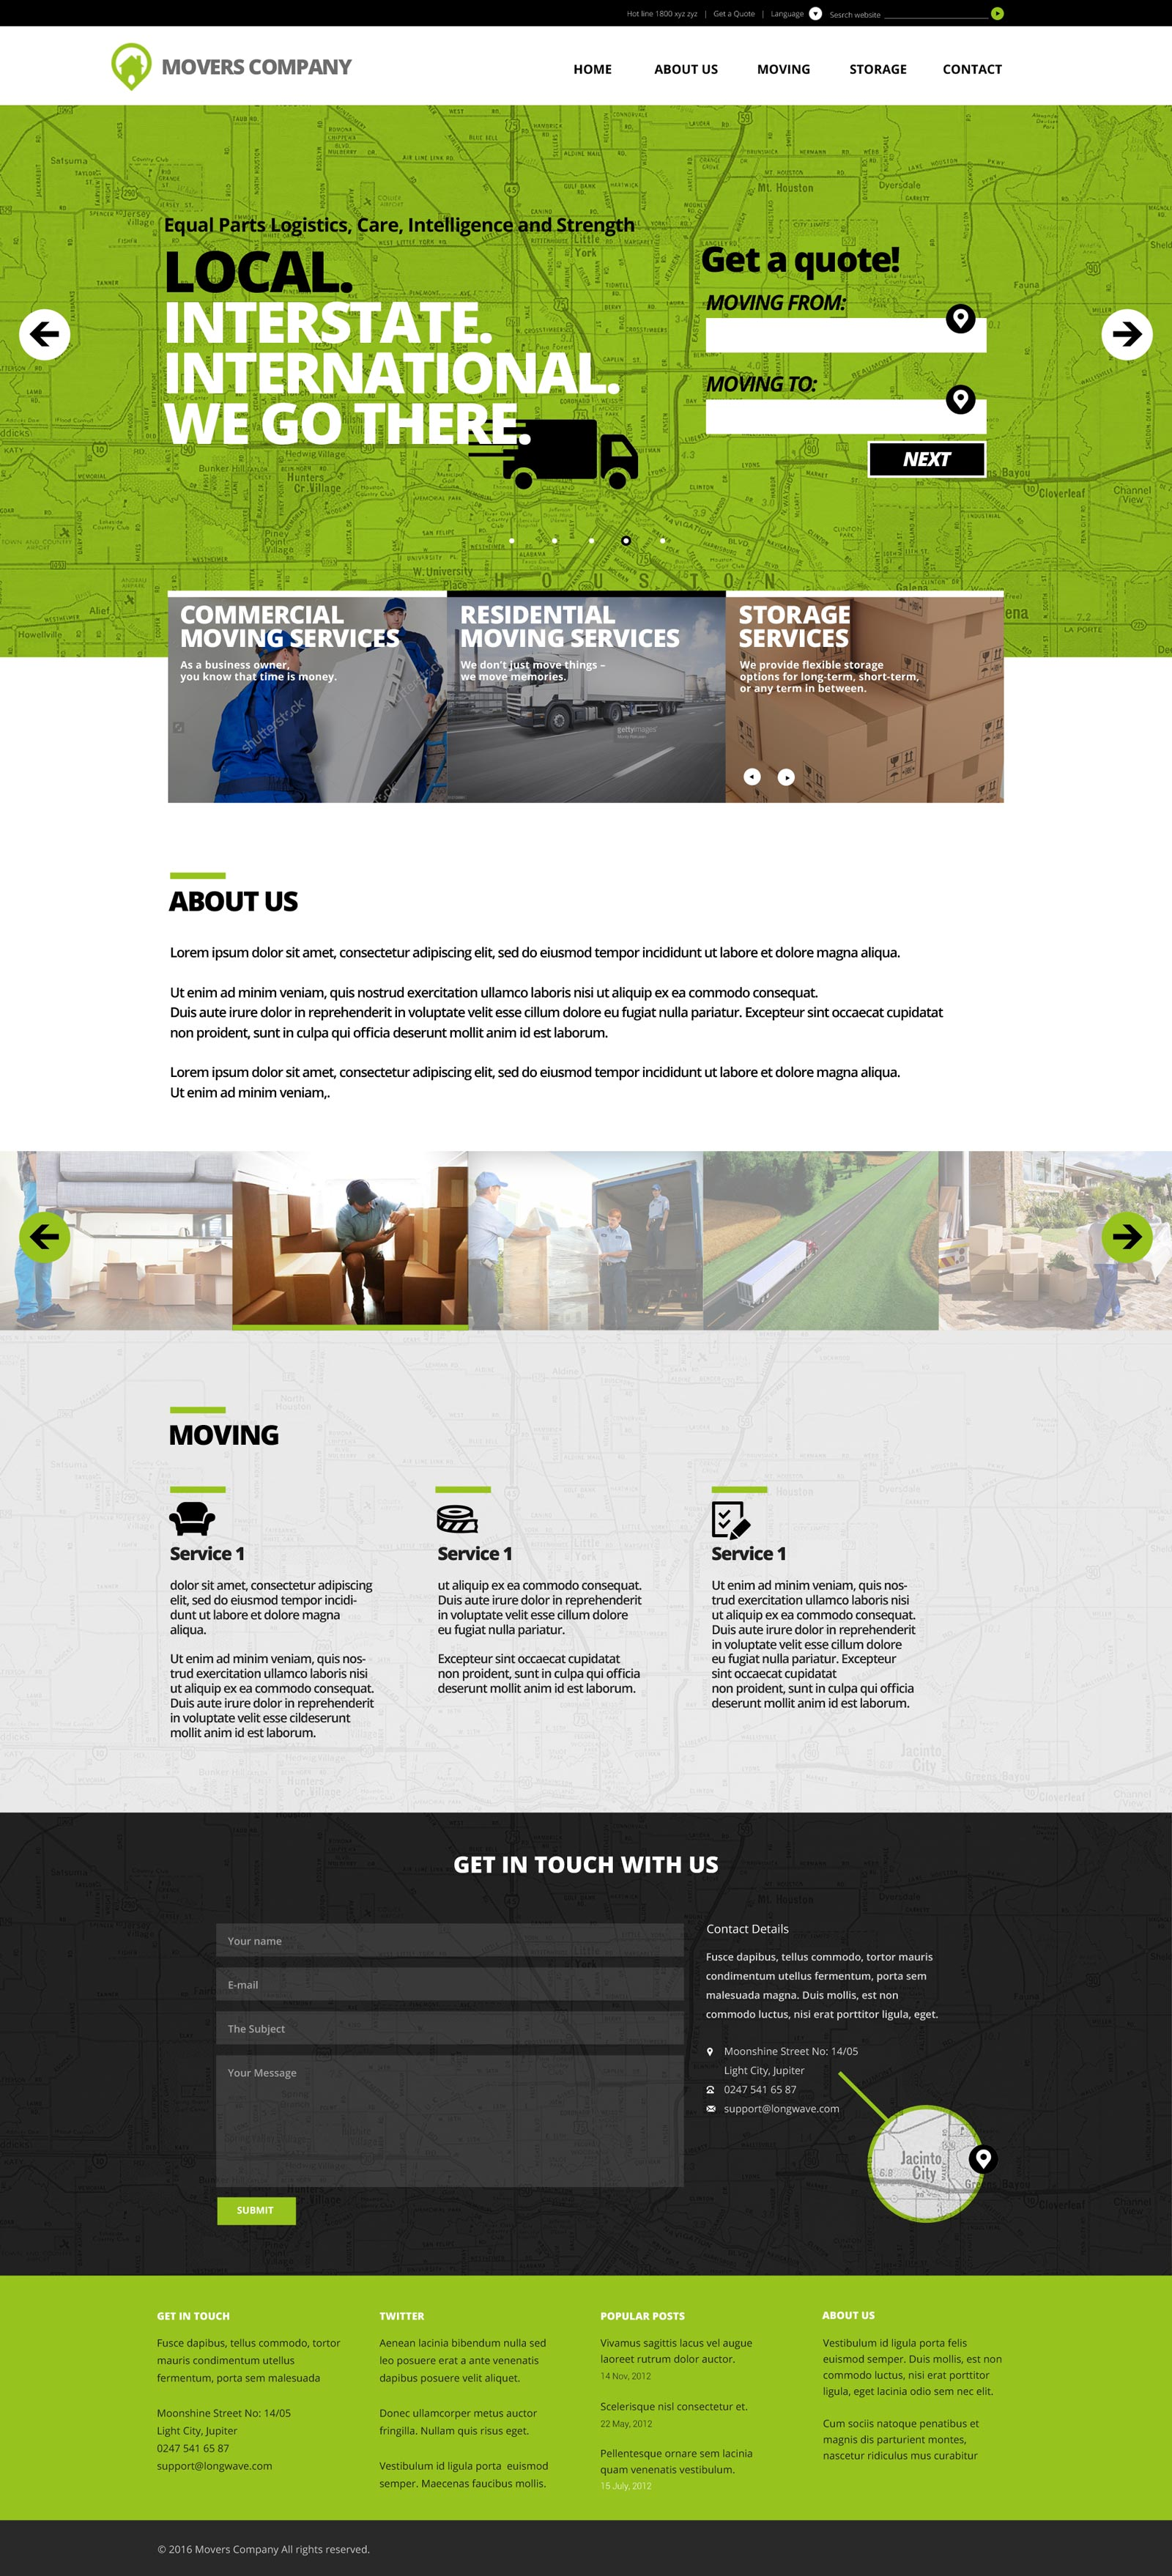 Design 2 Green